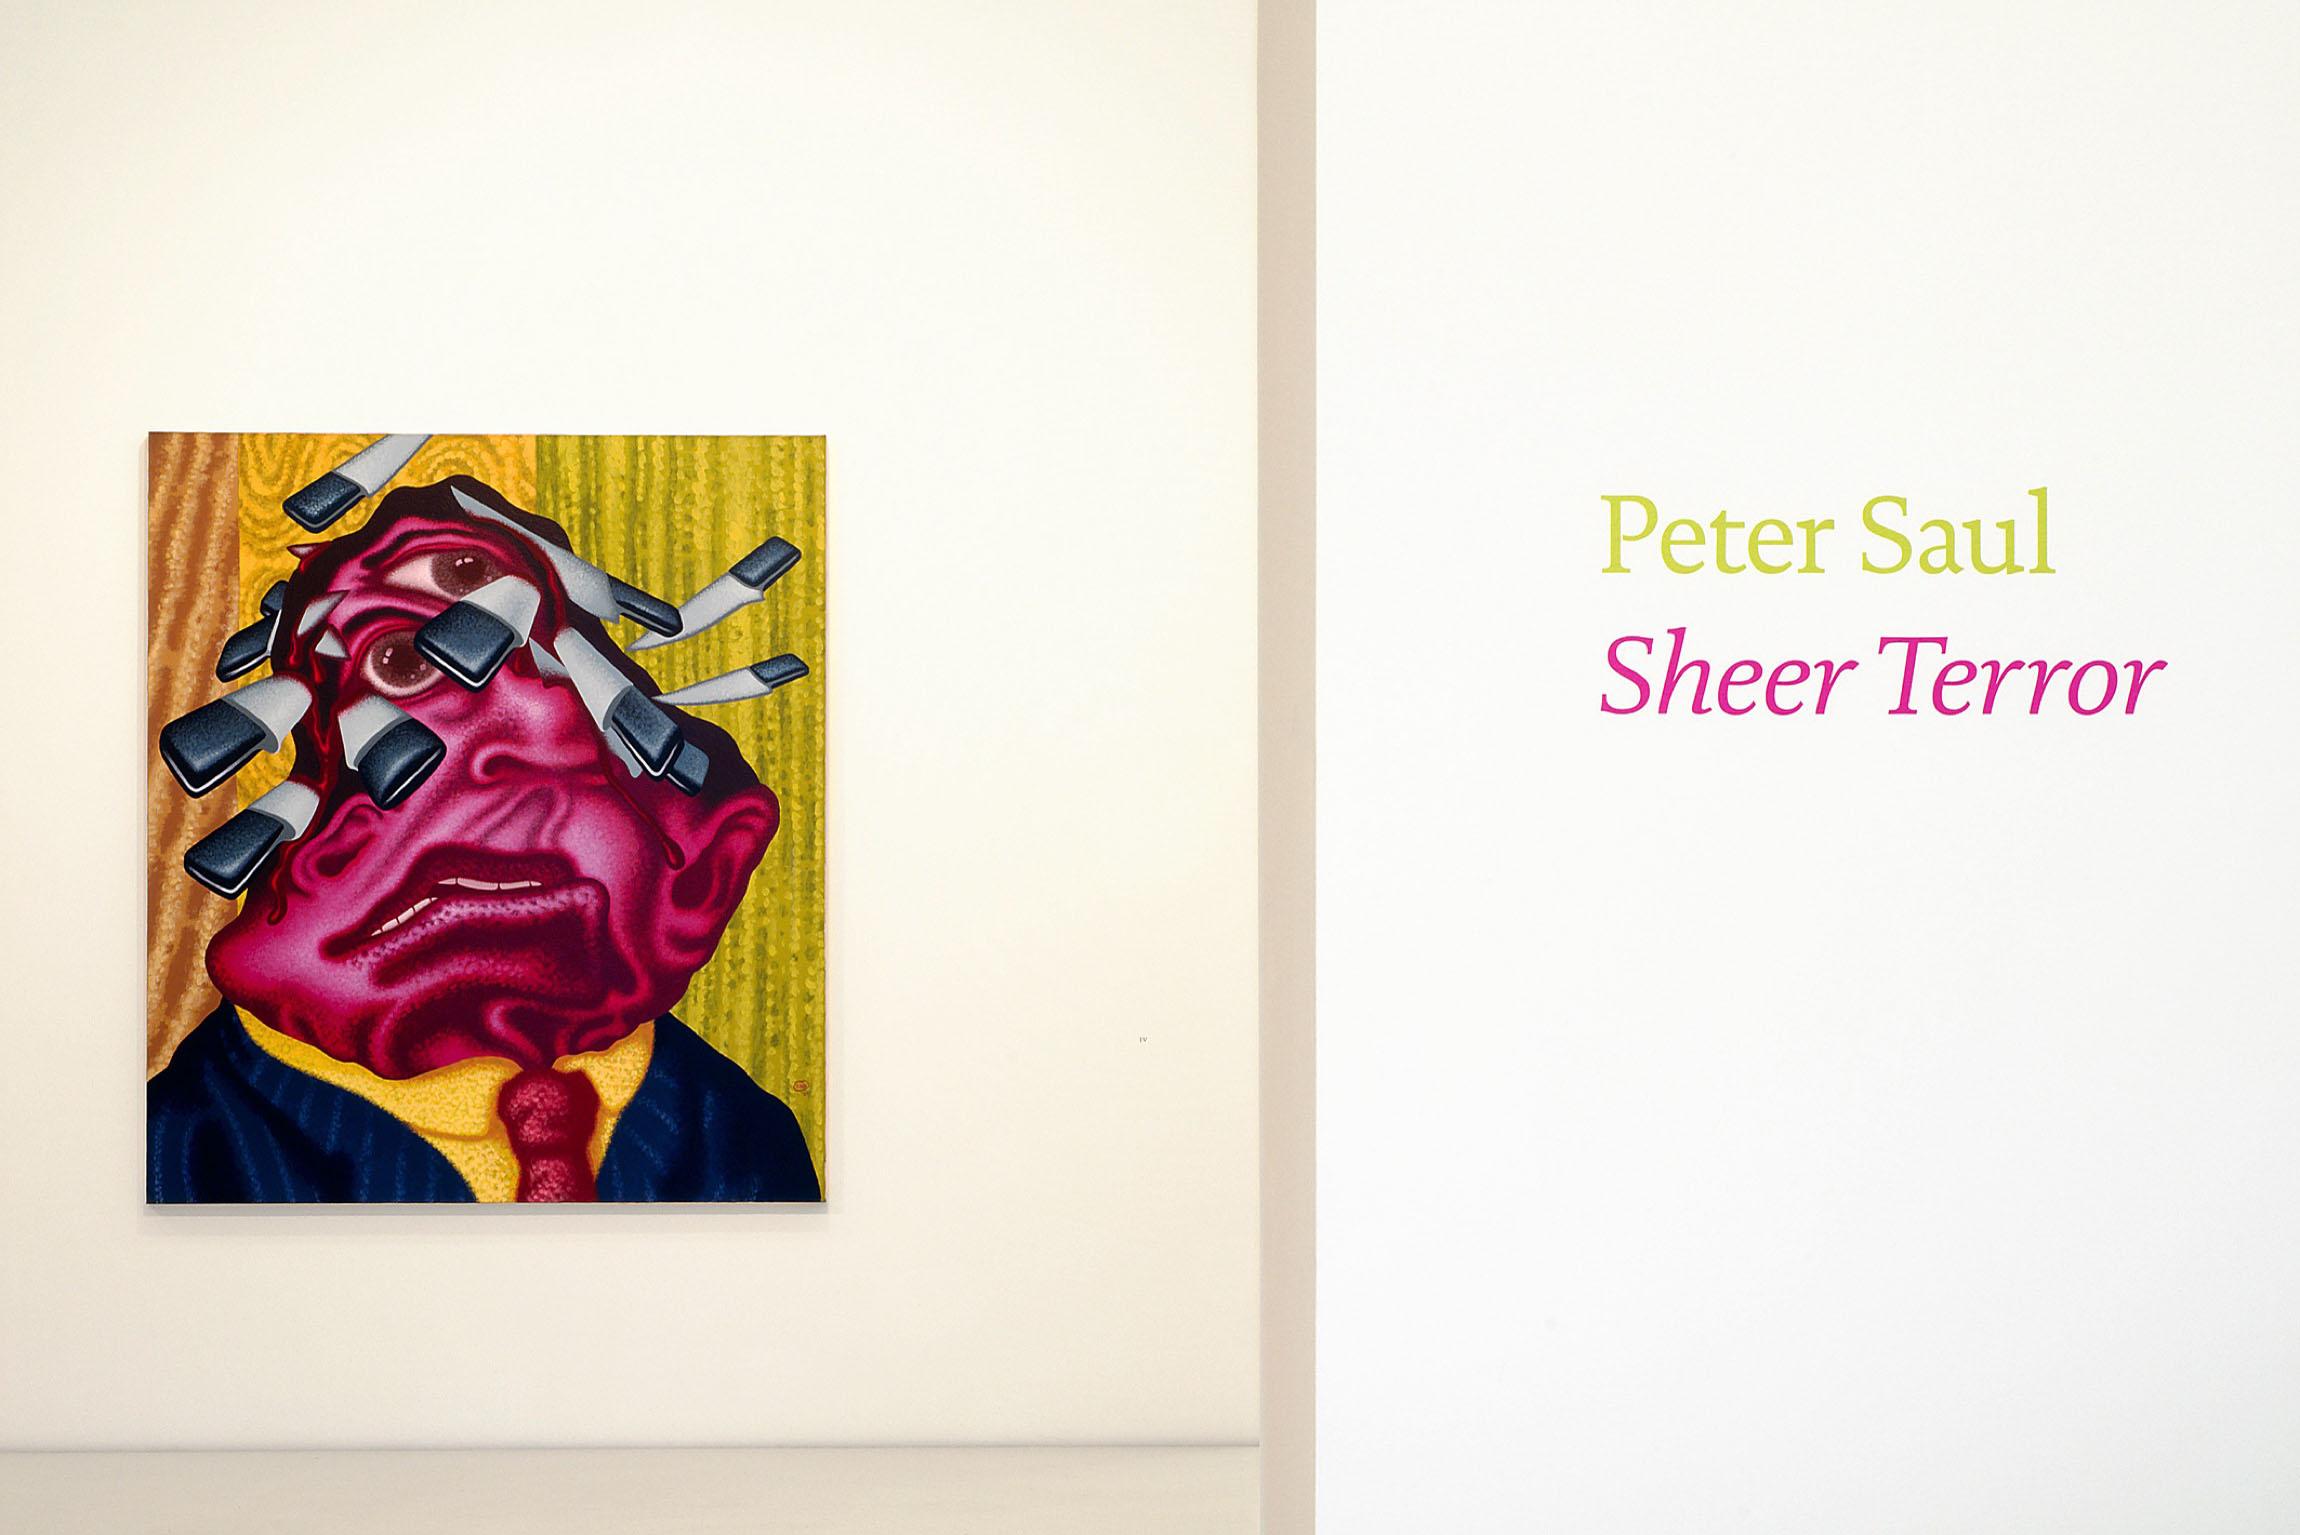 2010 Peter Saul Sheer Terror